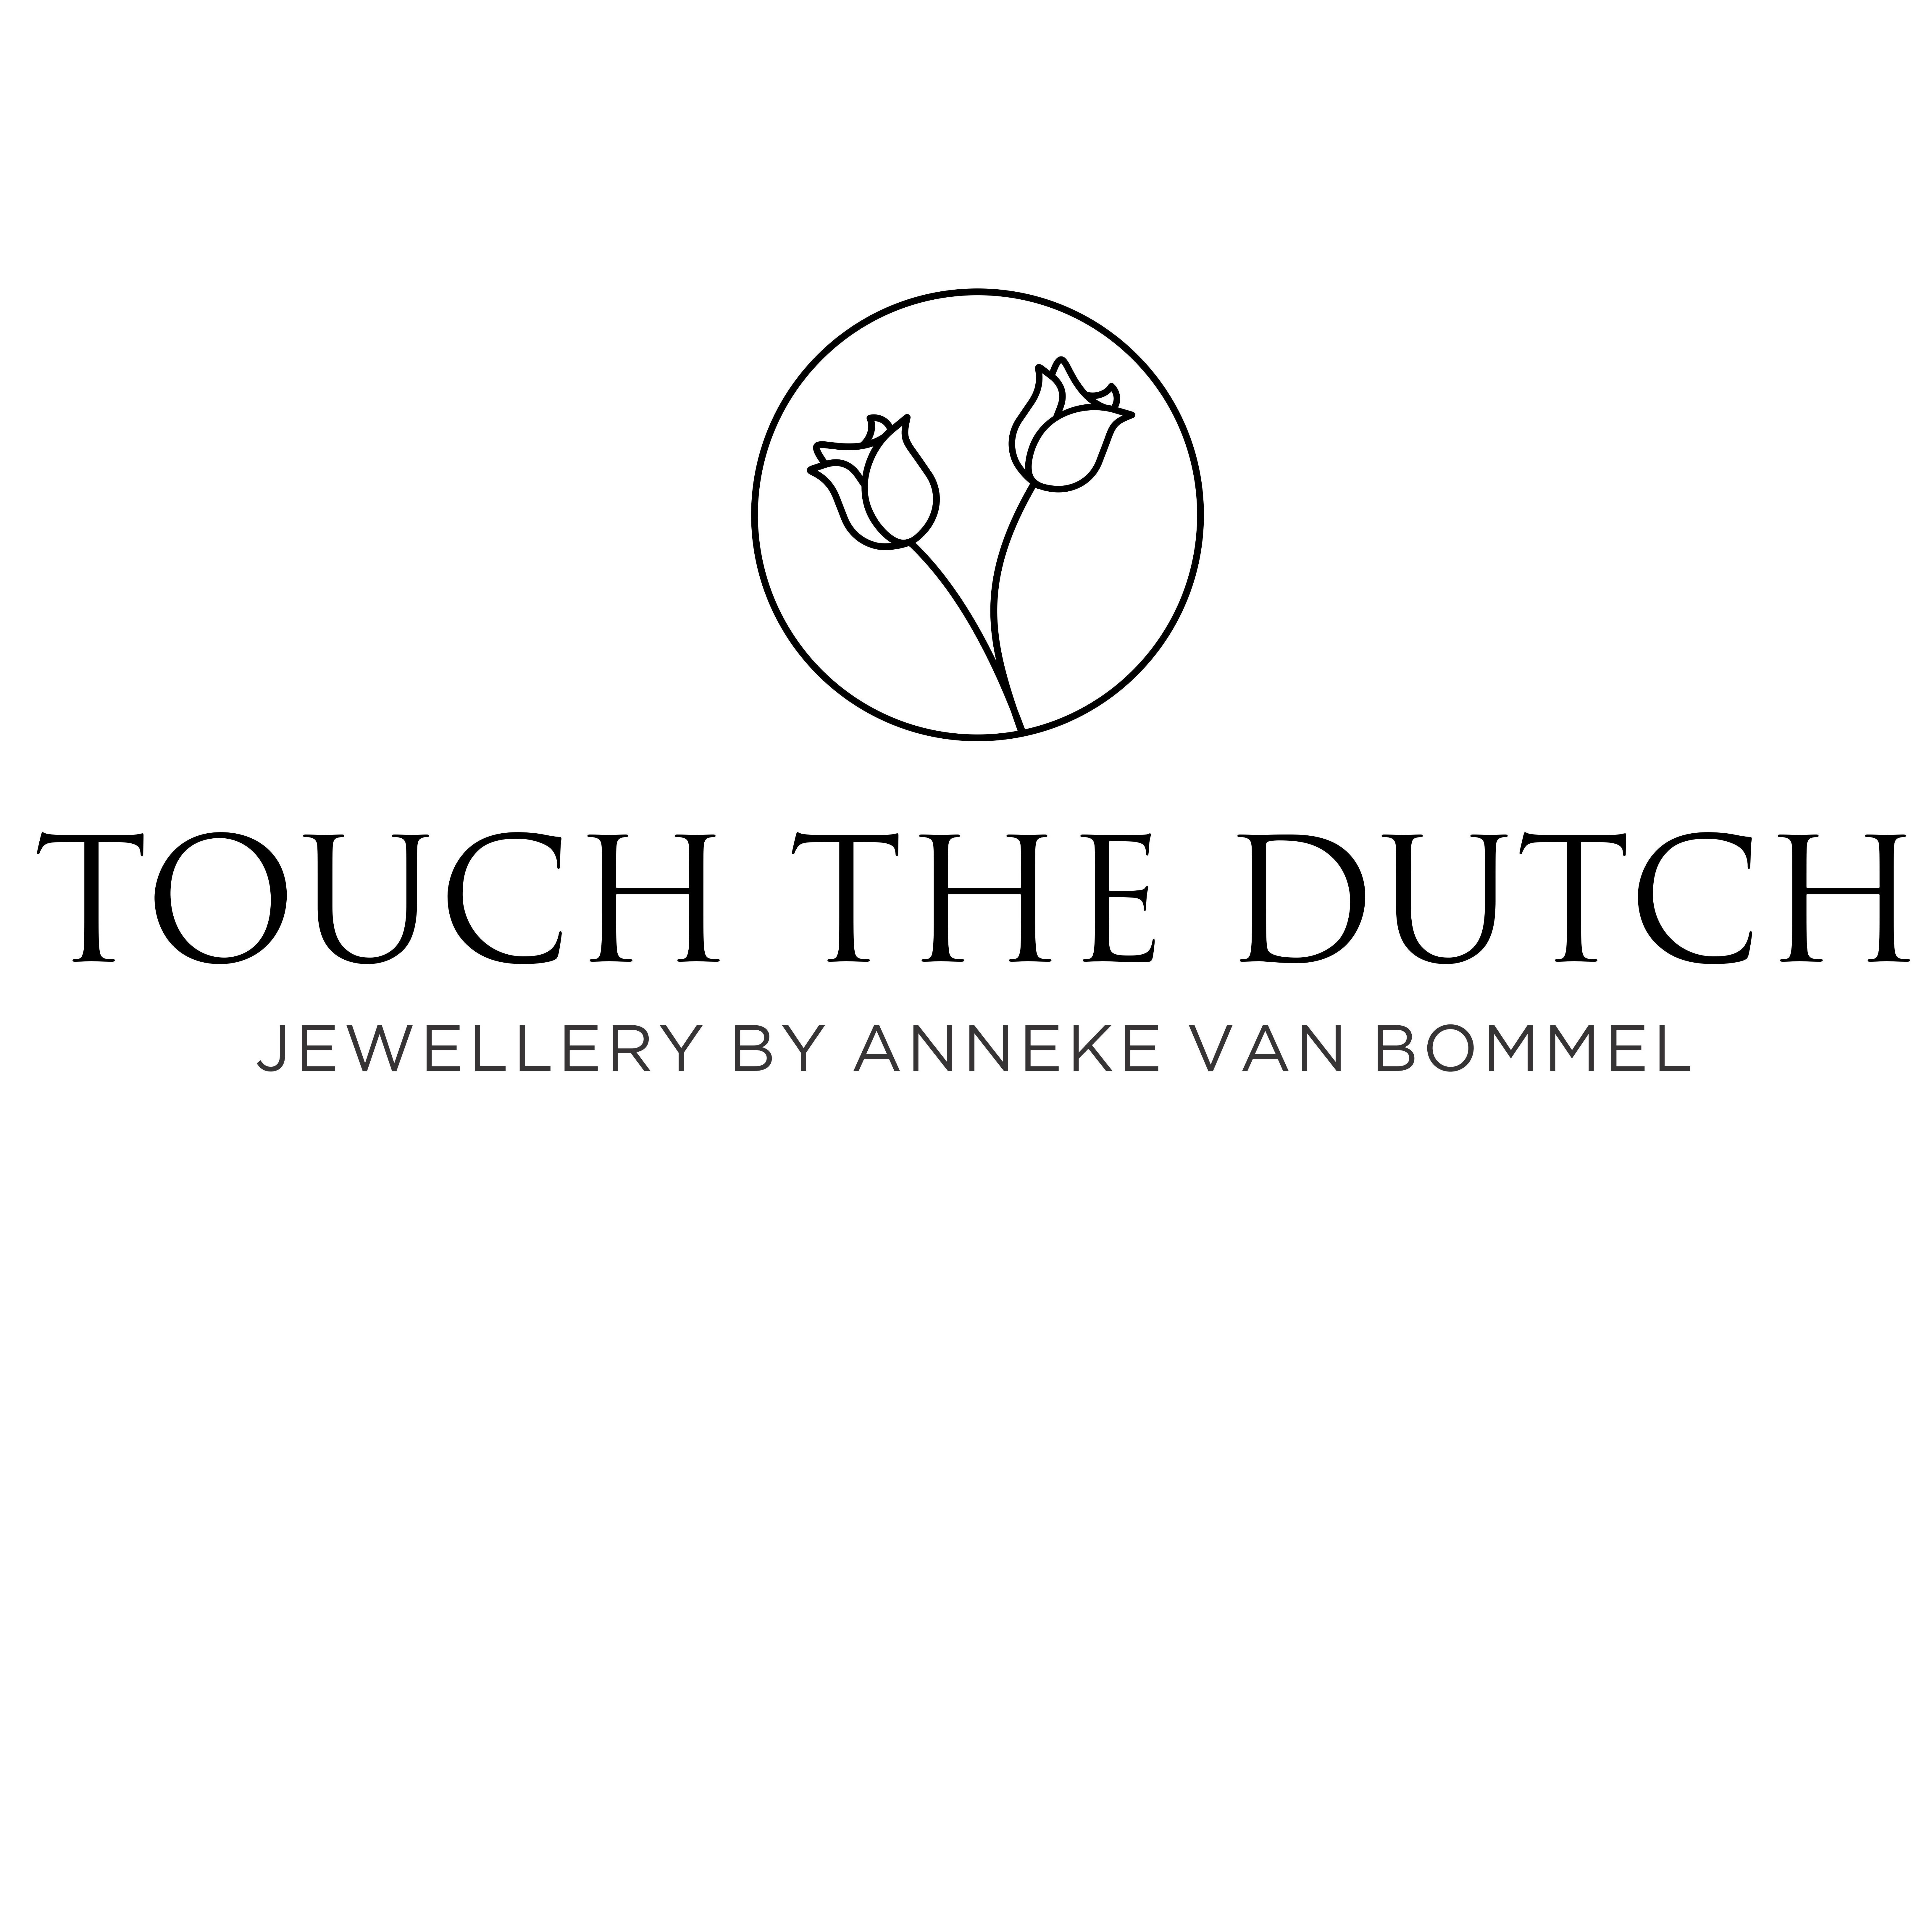 touchthedutch